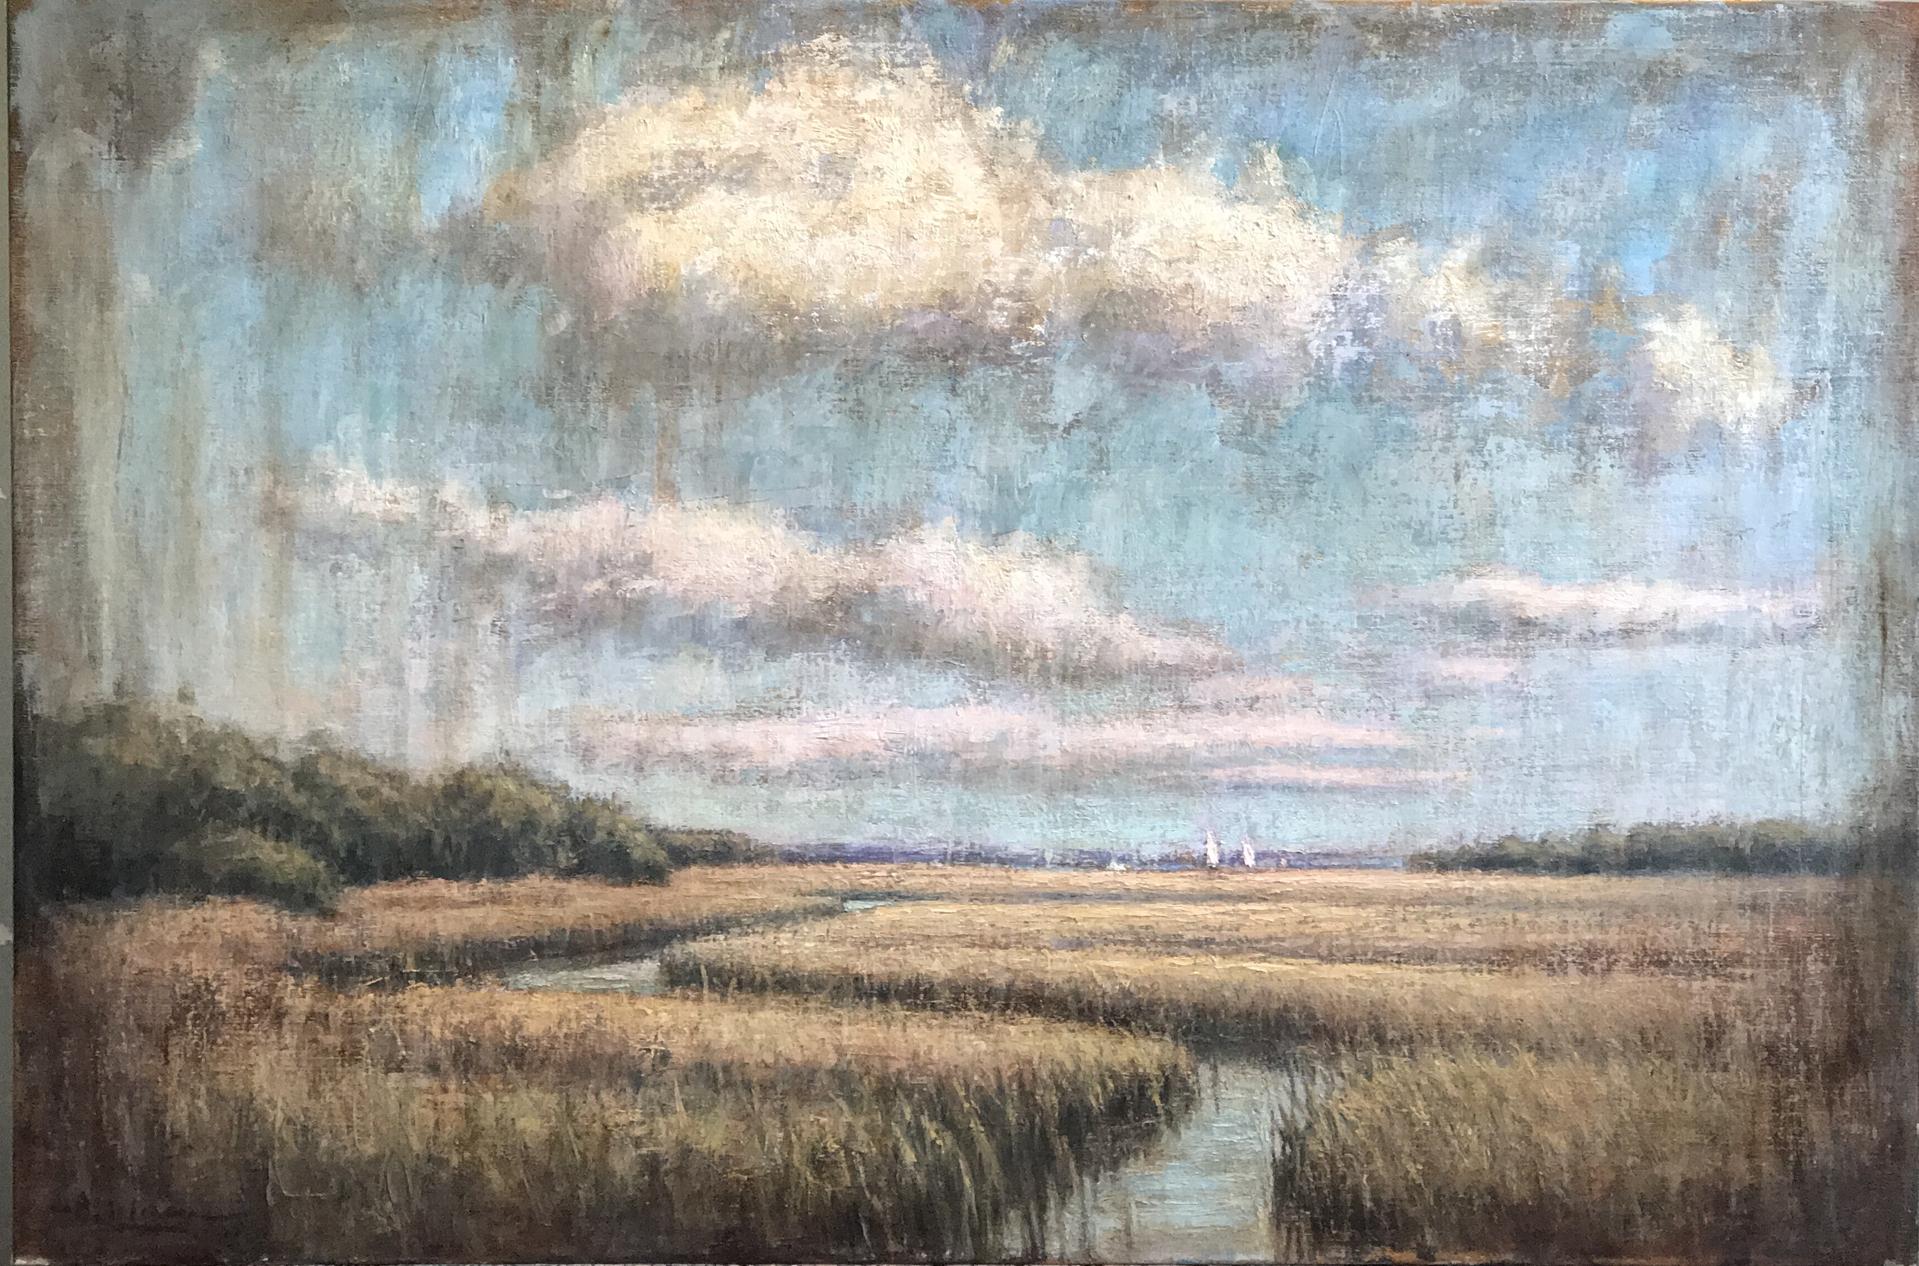 Passage by Brett Weaver